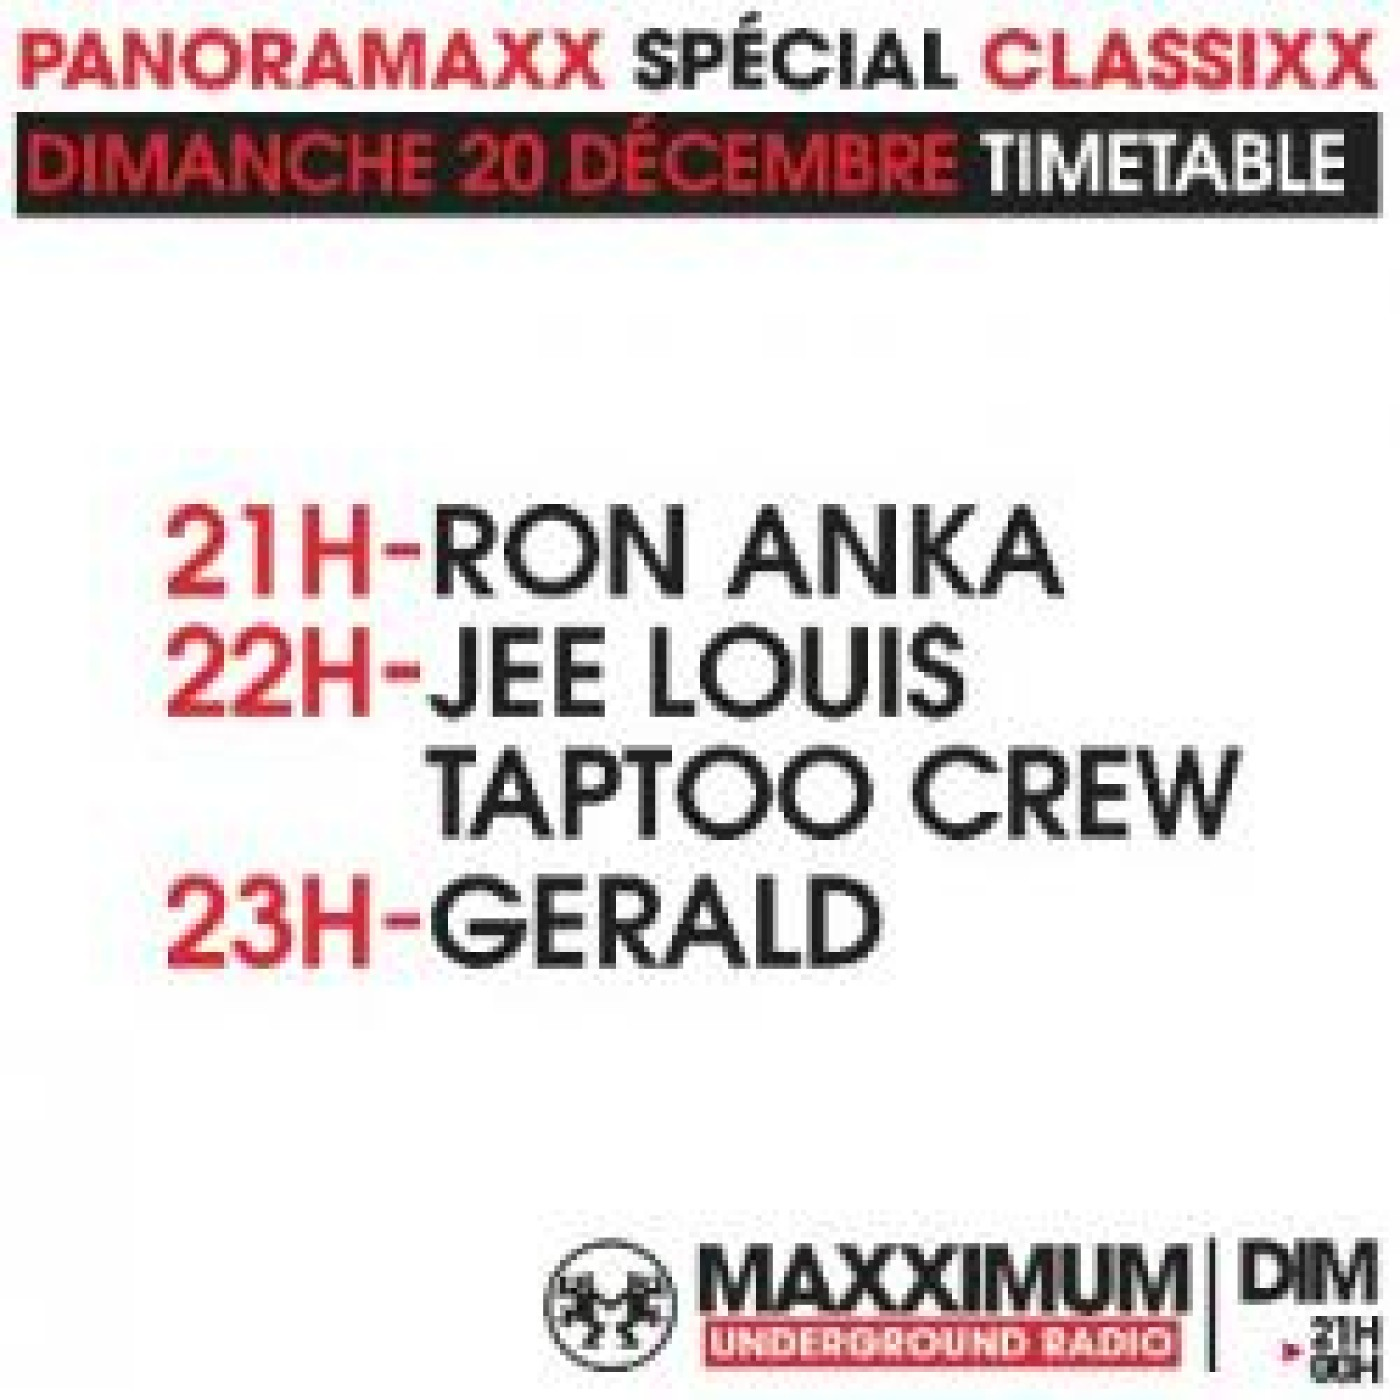 PANORAMAXX CLASSIXX : GERALD